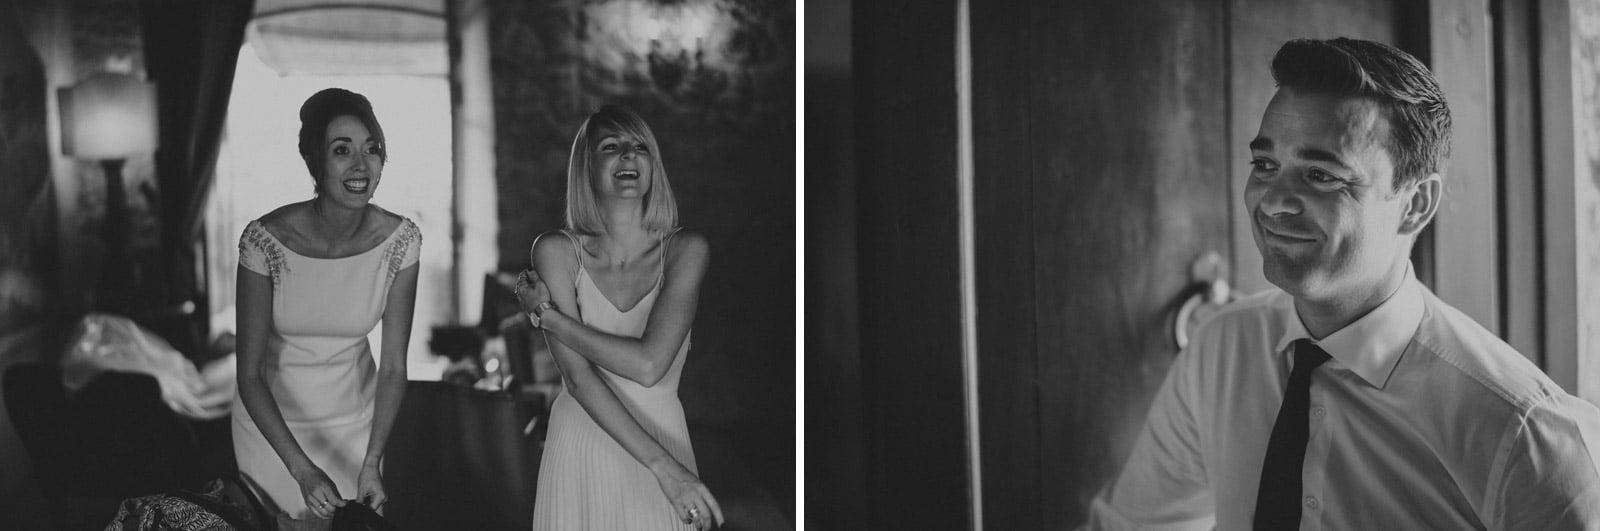 027-wedding-tuscany-san-galgano-federico-pannacci-photographer